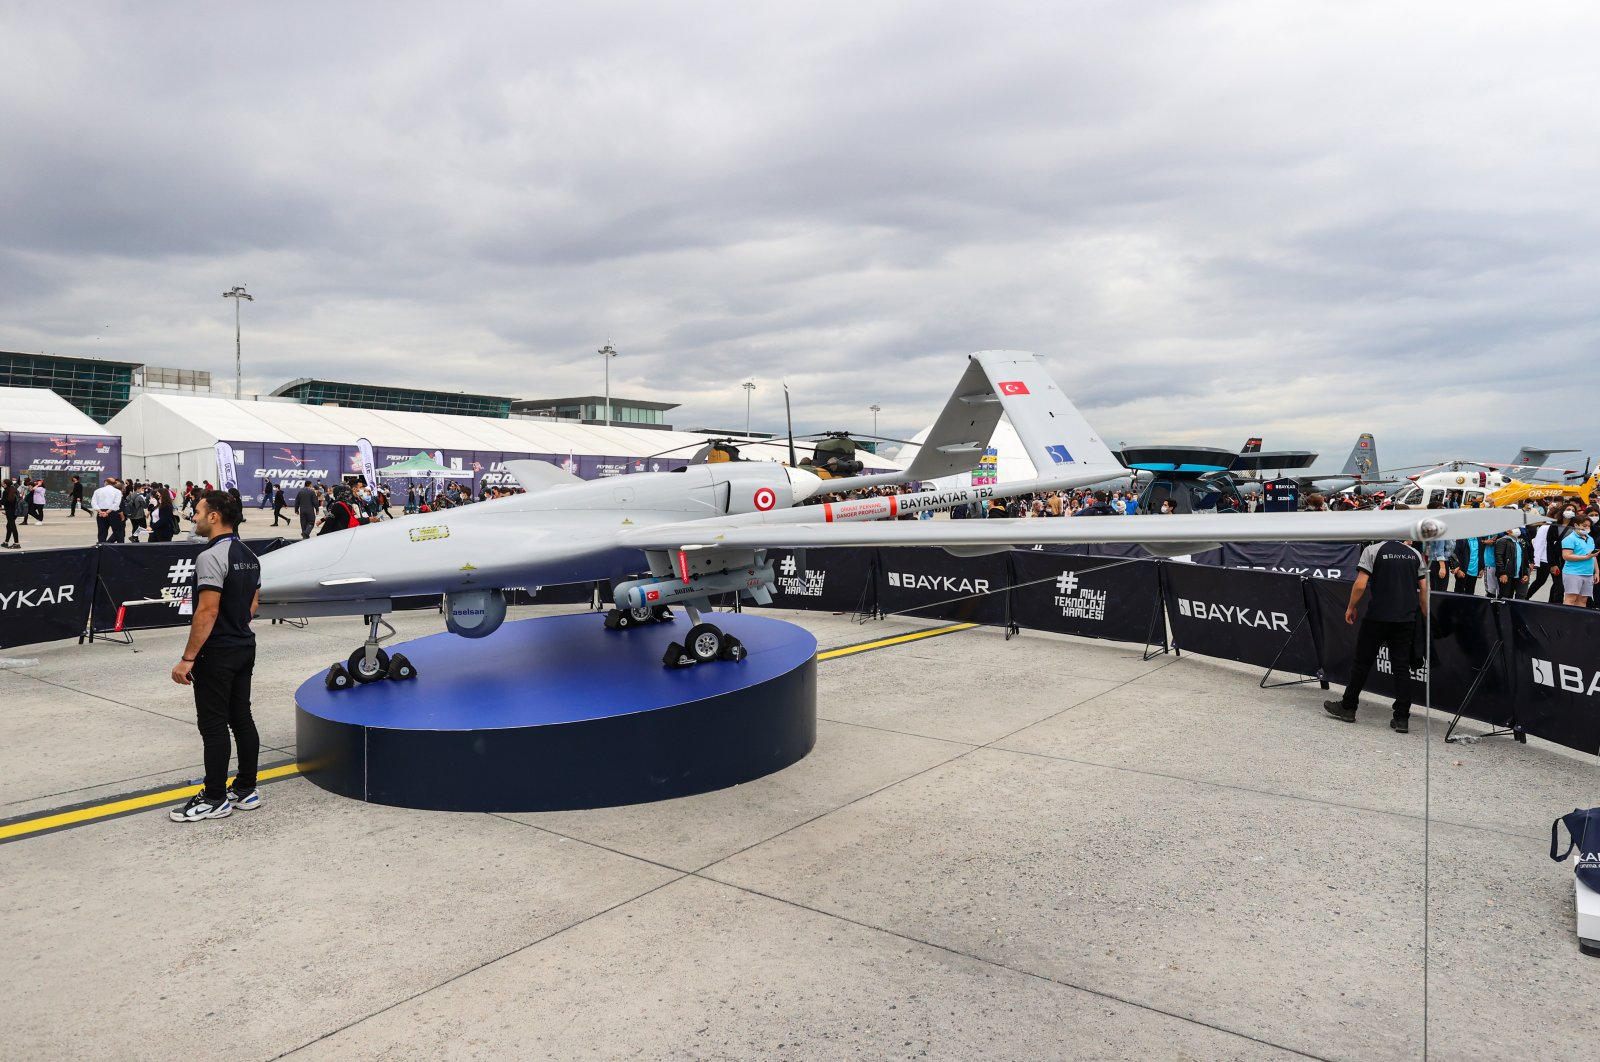 Baykar's Bayraktar TB2 UAV on display at Teknofest, Istanbul, Turkey, Sept. 22, 2021. (AA Photo)